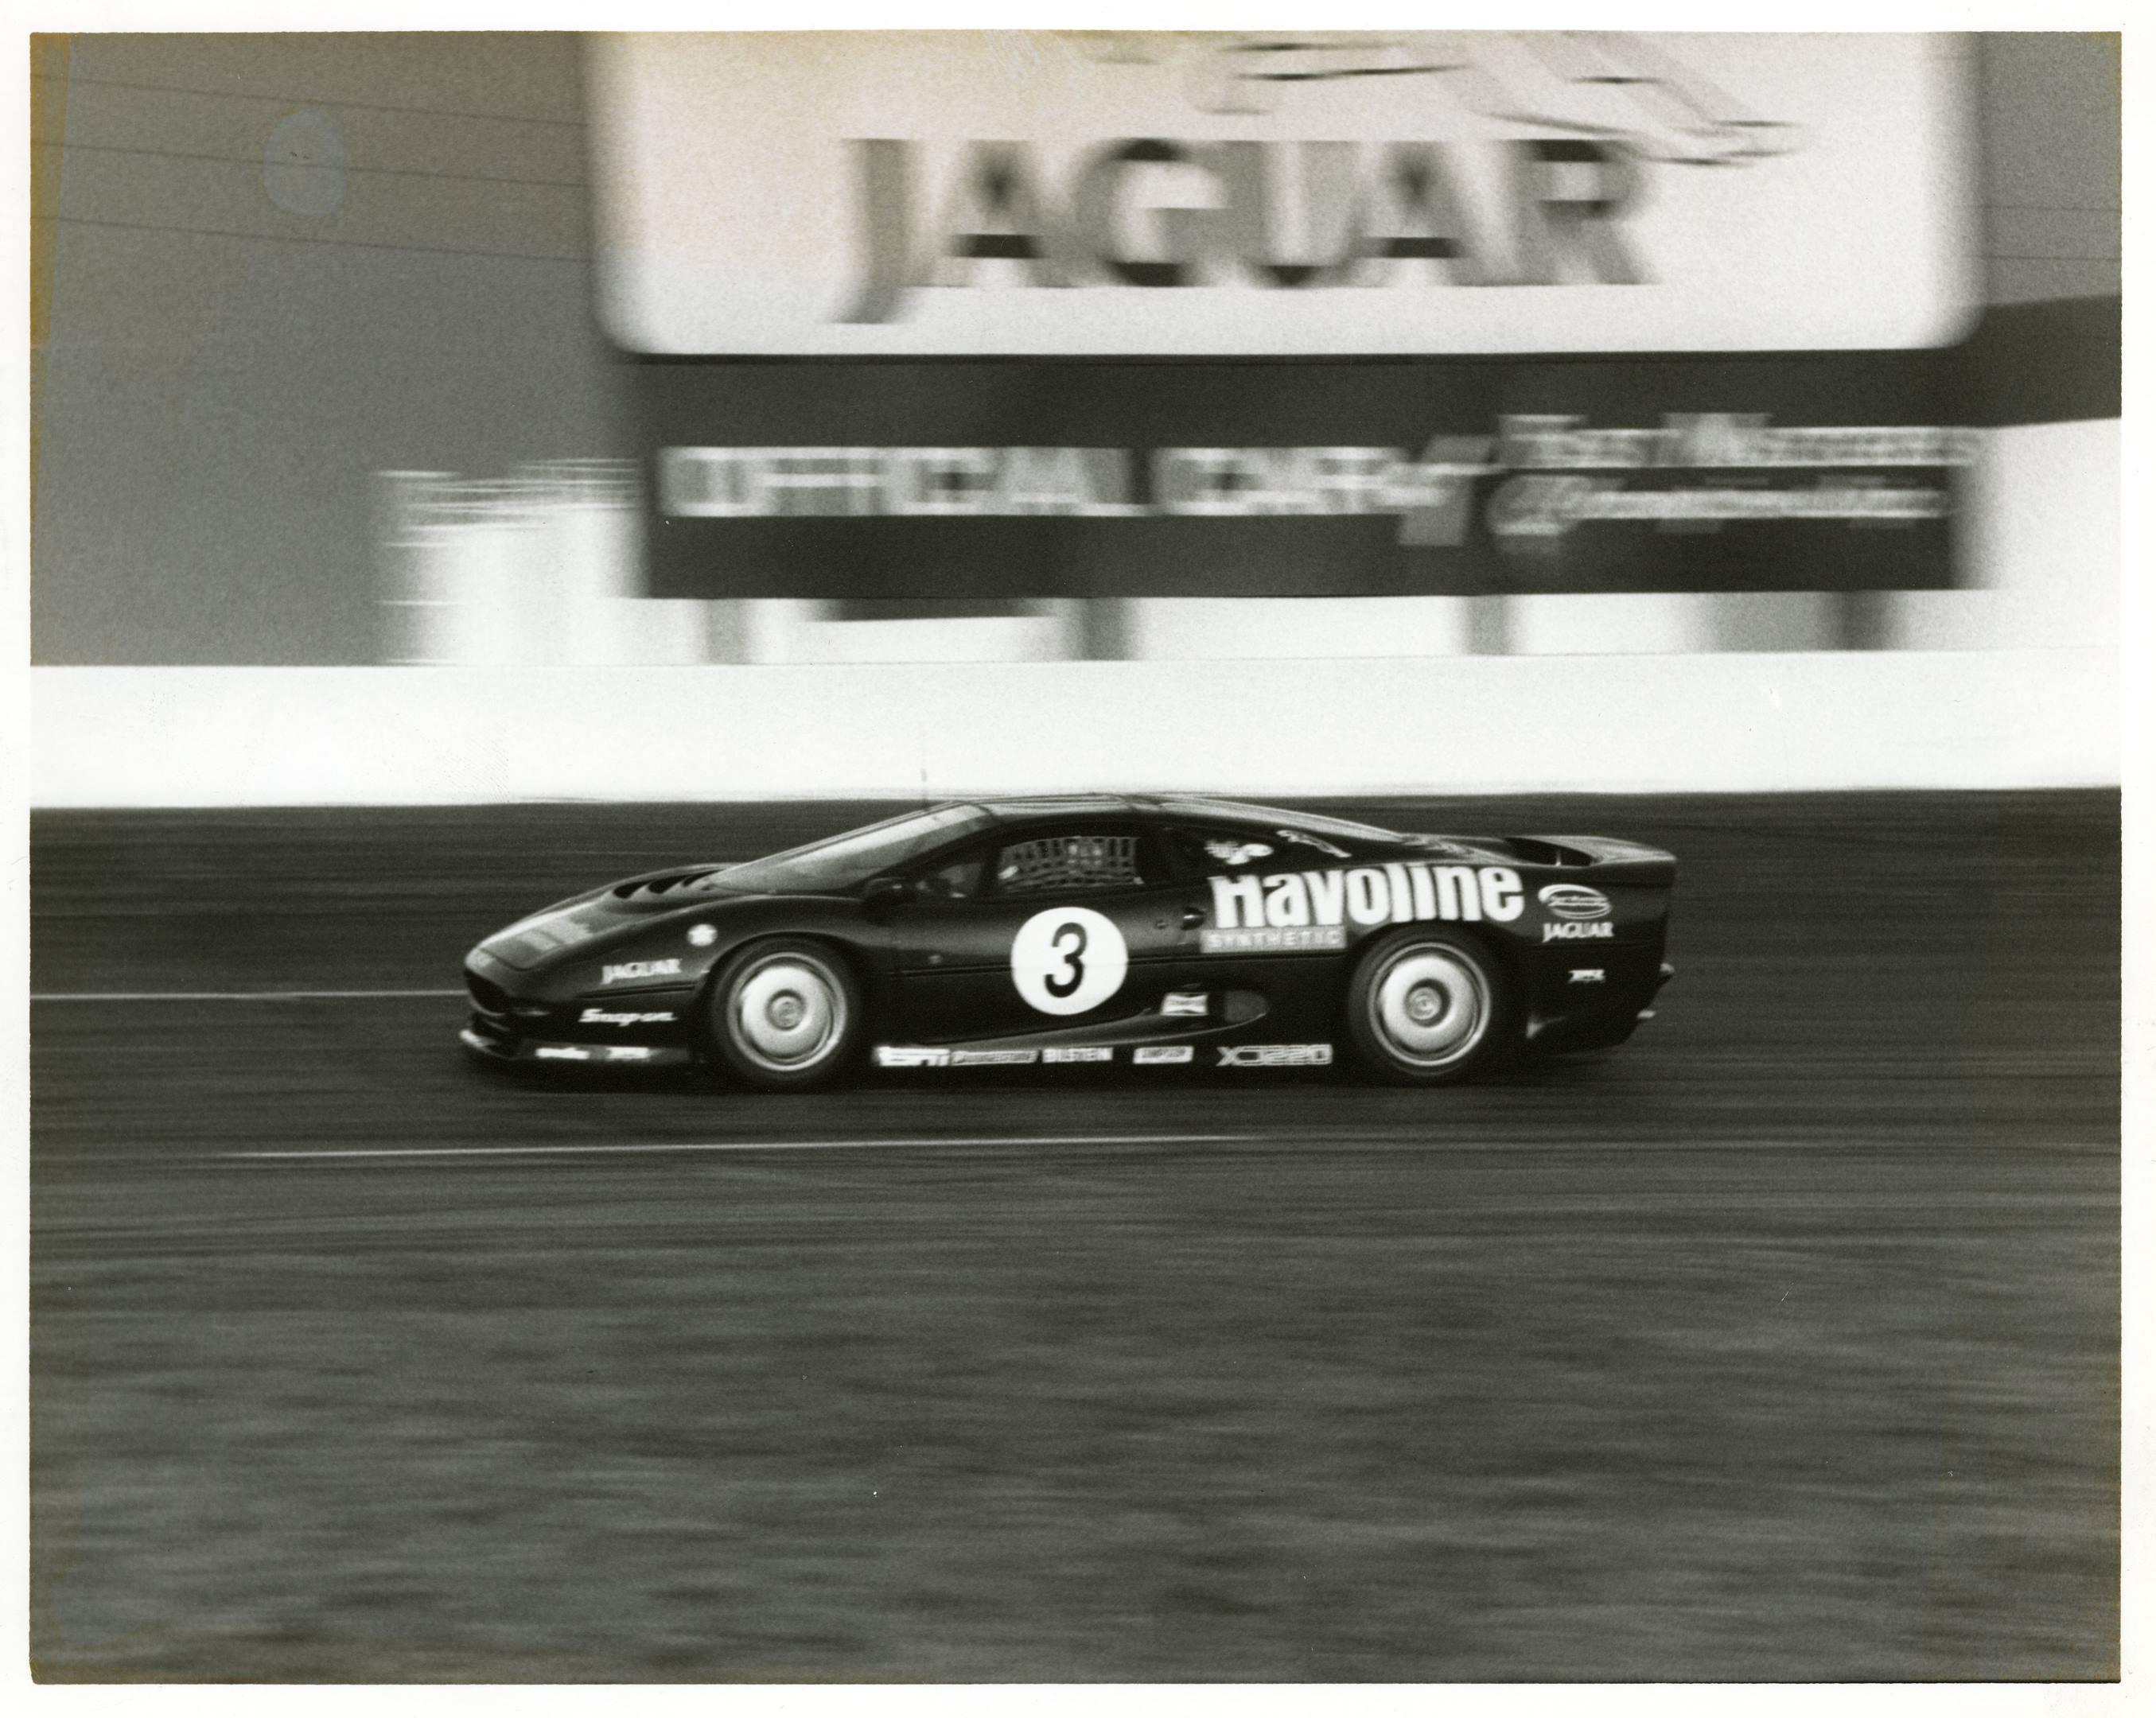 Jaguar XJ220 on the track